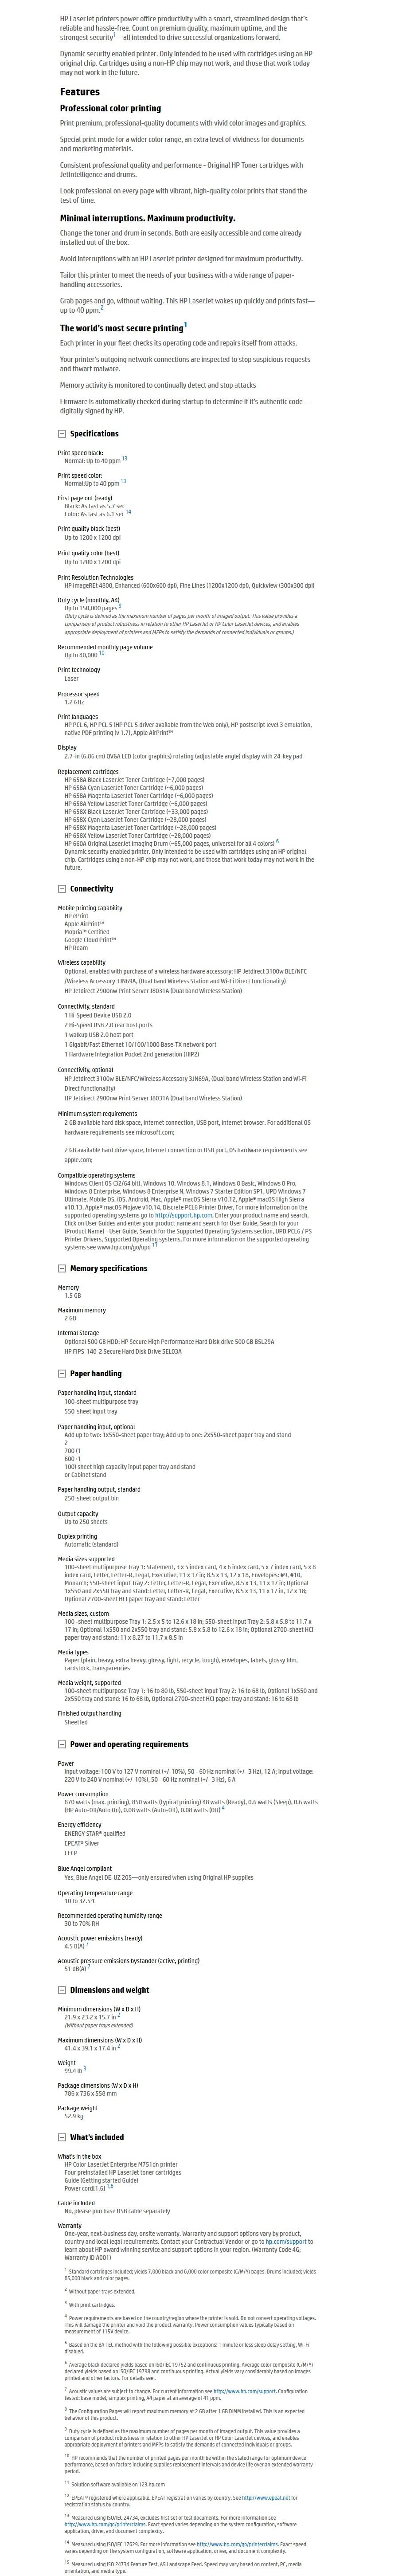 HP LaserJet Enterprise M751dn Colour Wireless Laser Printer - Desktop Overview 1